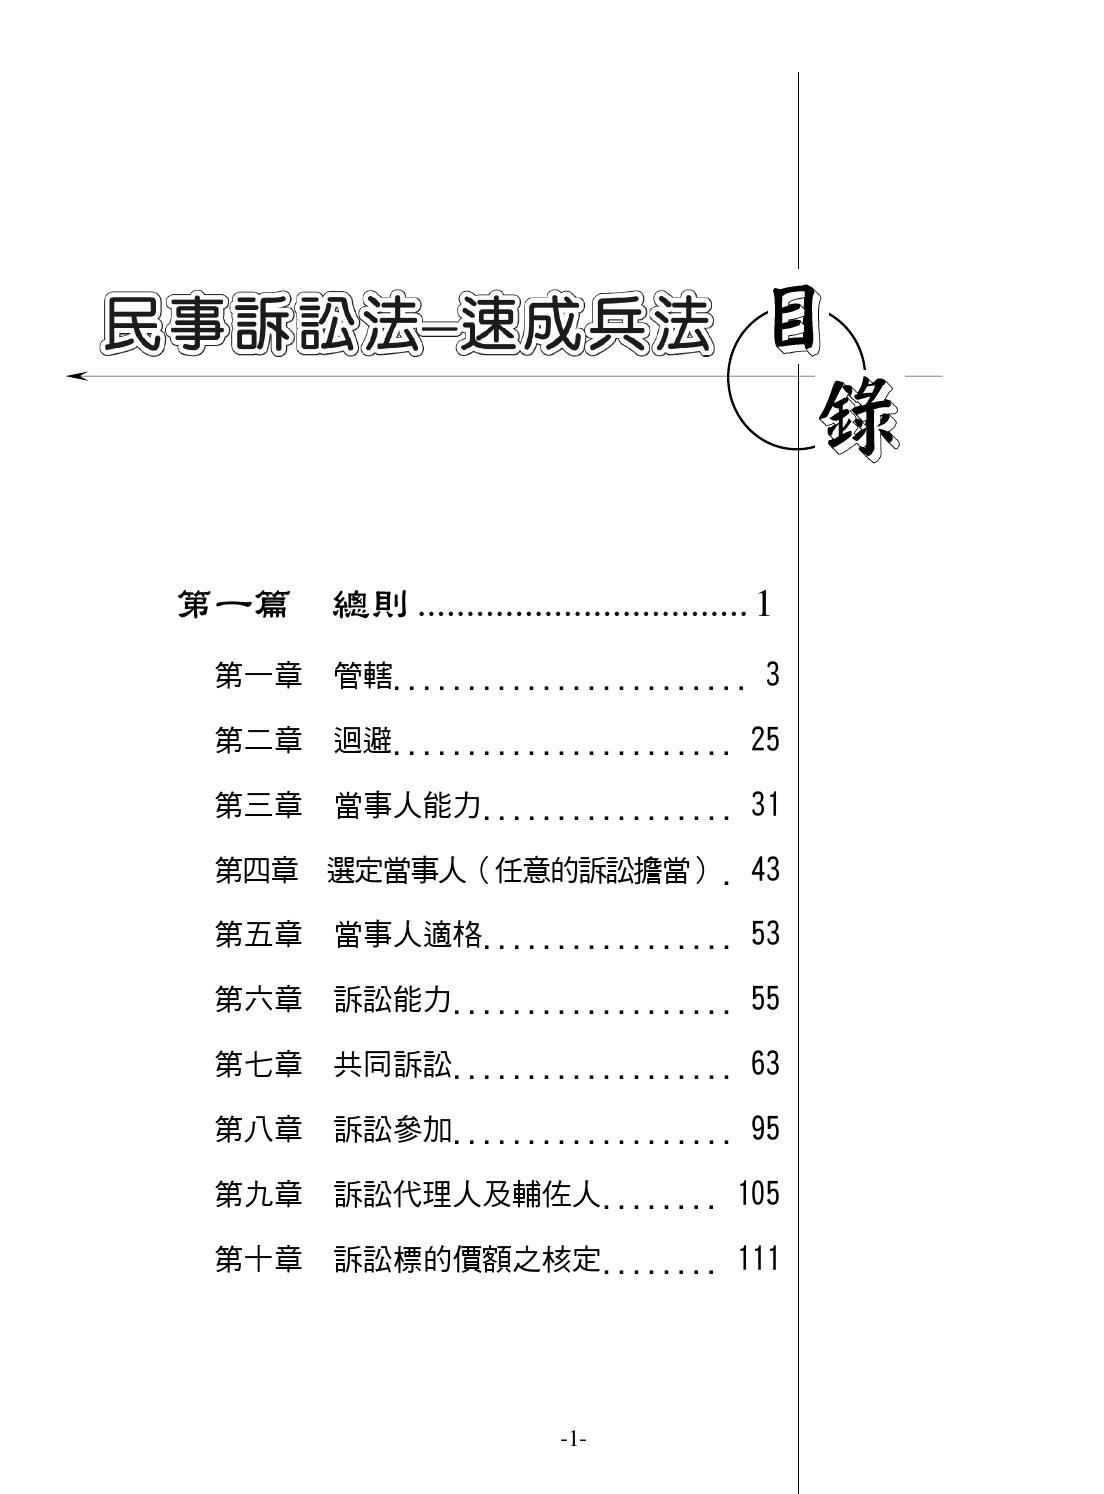 1b706 by 新保成出版社 - Issuu